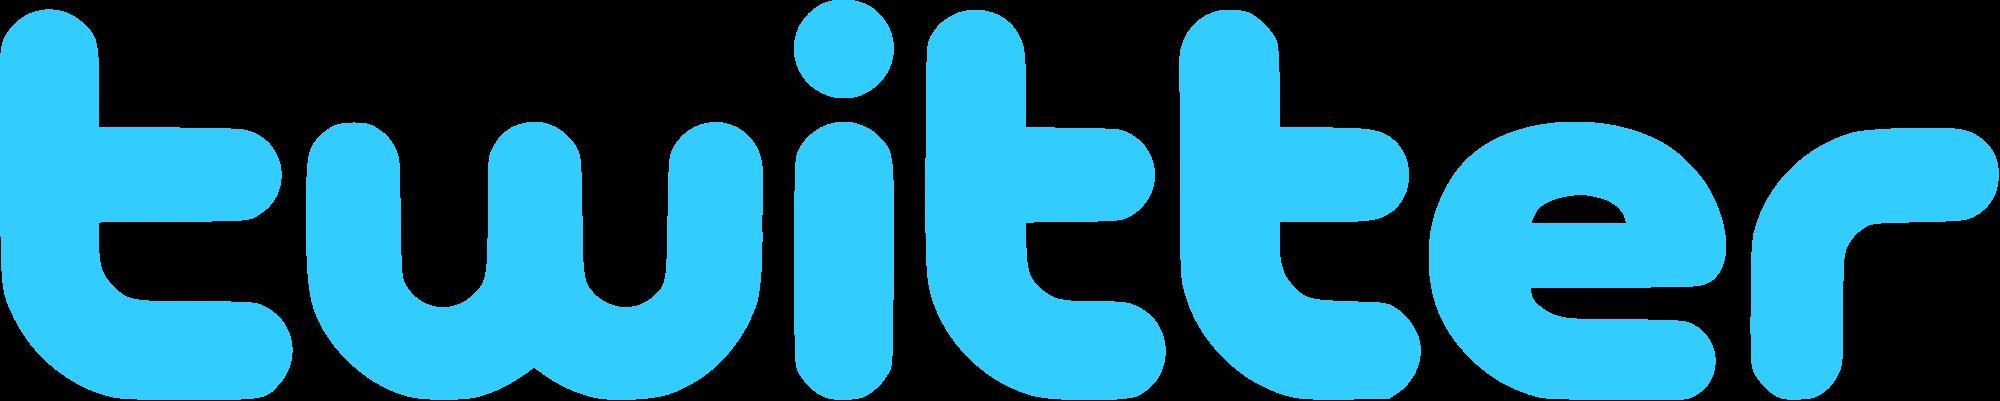 Twitter Logo PNG - 108806